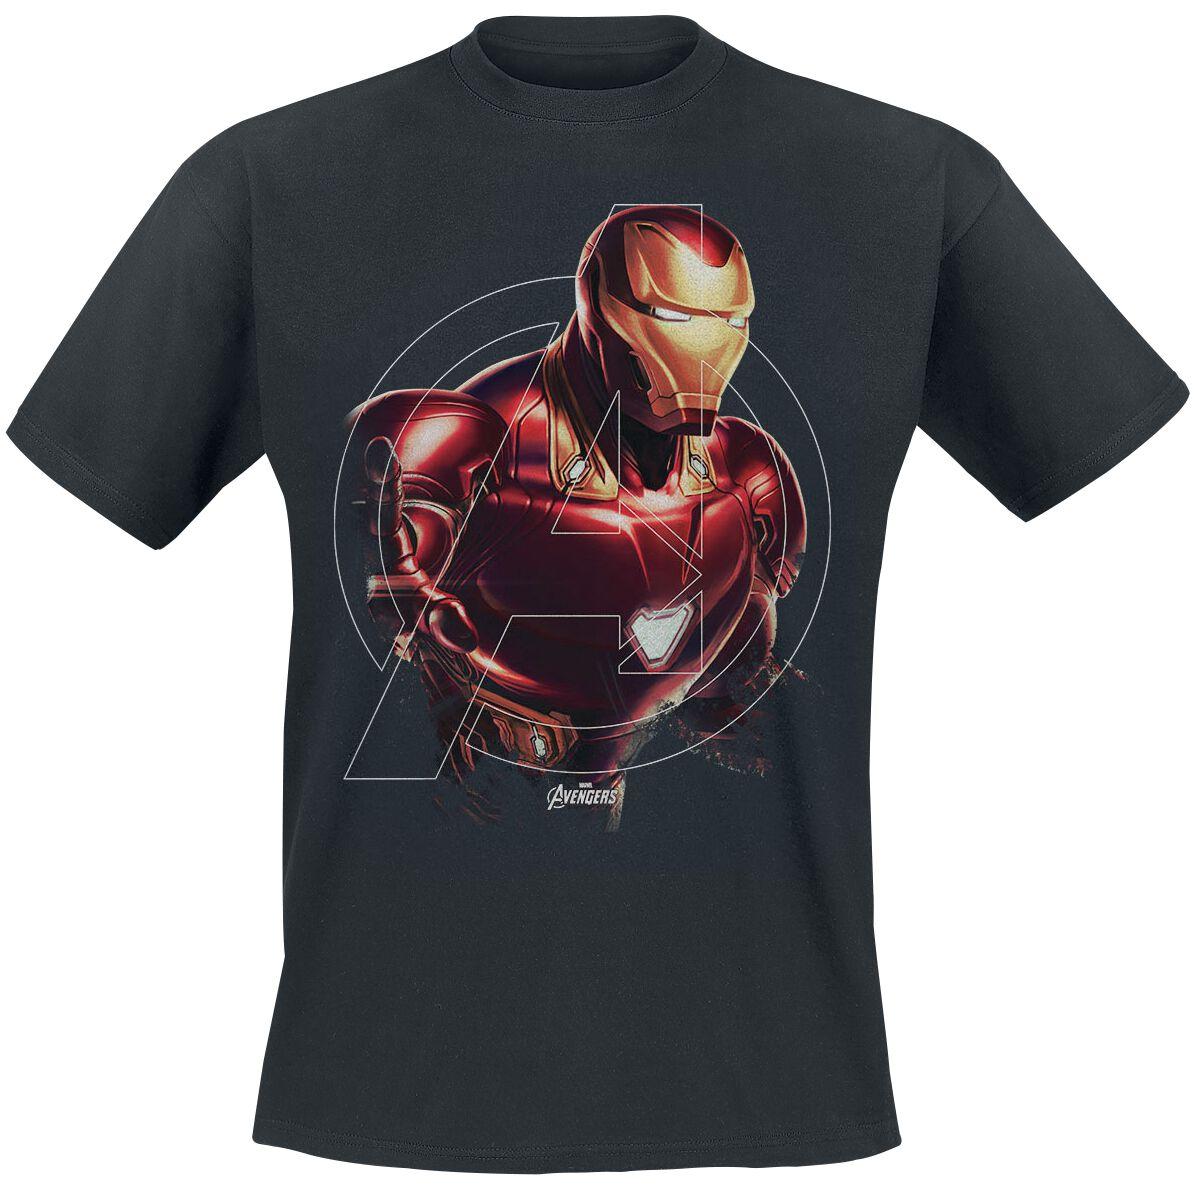 Avengers Iron Man powered by EMP